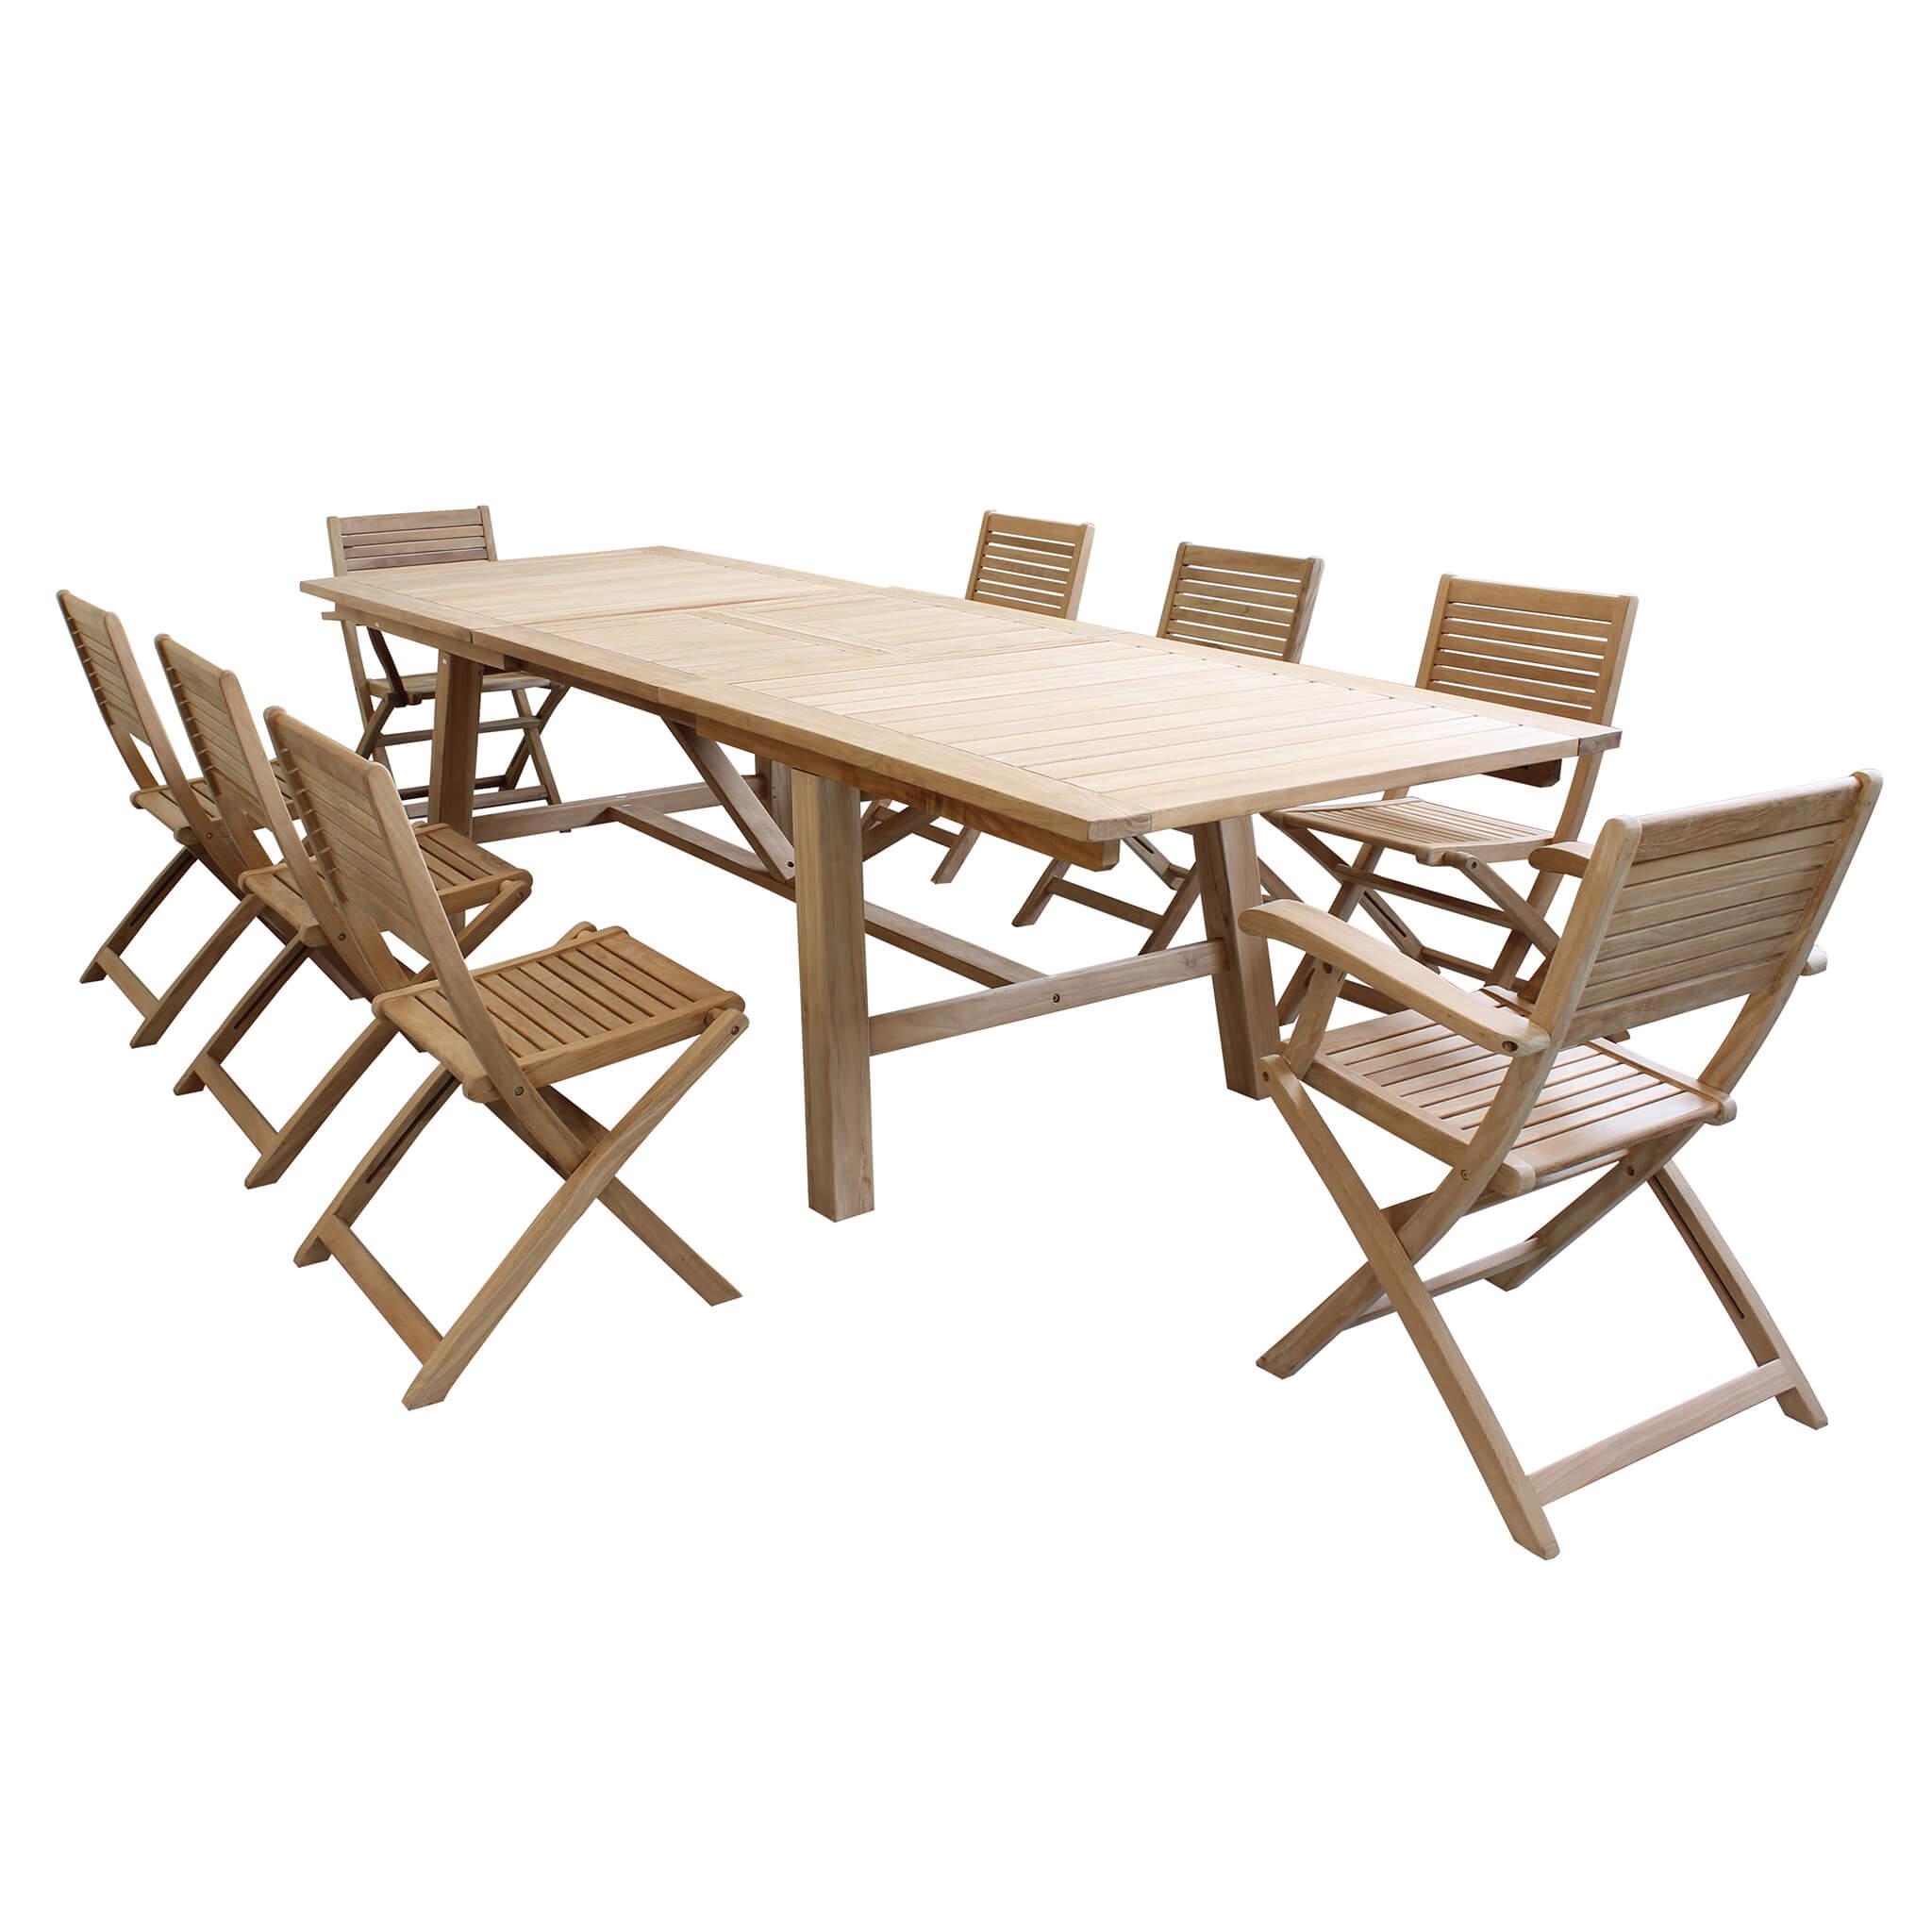 Milani Home ORATOR - set tavolo in teak cm.220/300 x 100 x 77 h con 8 sedute